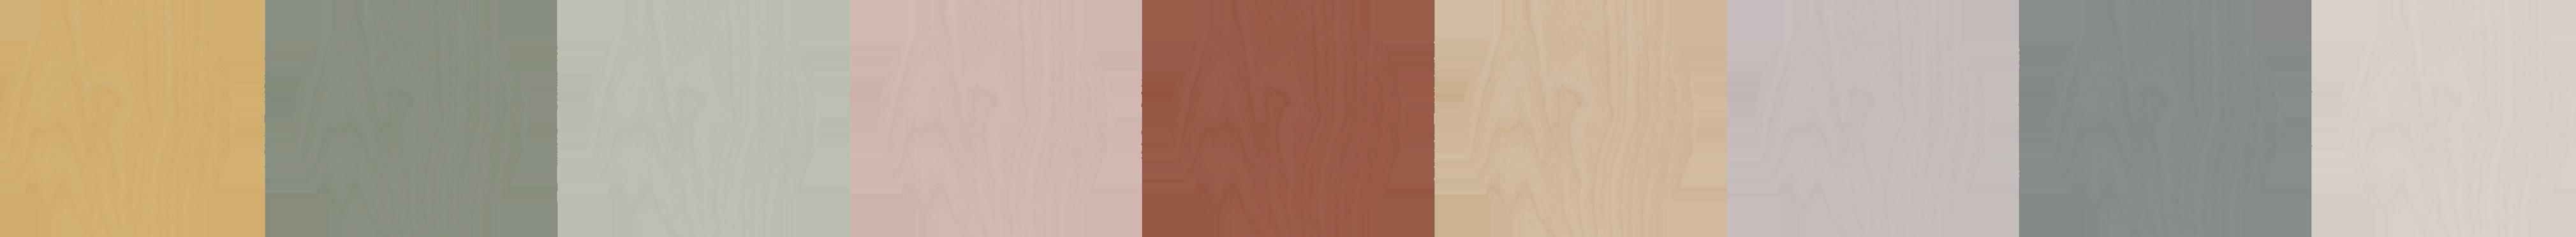 juguetes-madera-tienda-tre-traditional-timber-toys-colores-texturas-02.png (4039×372)